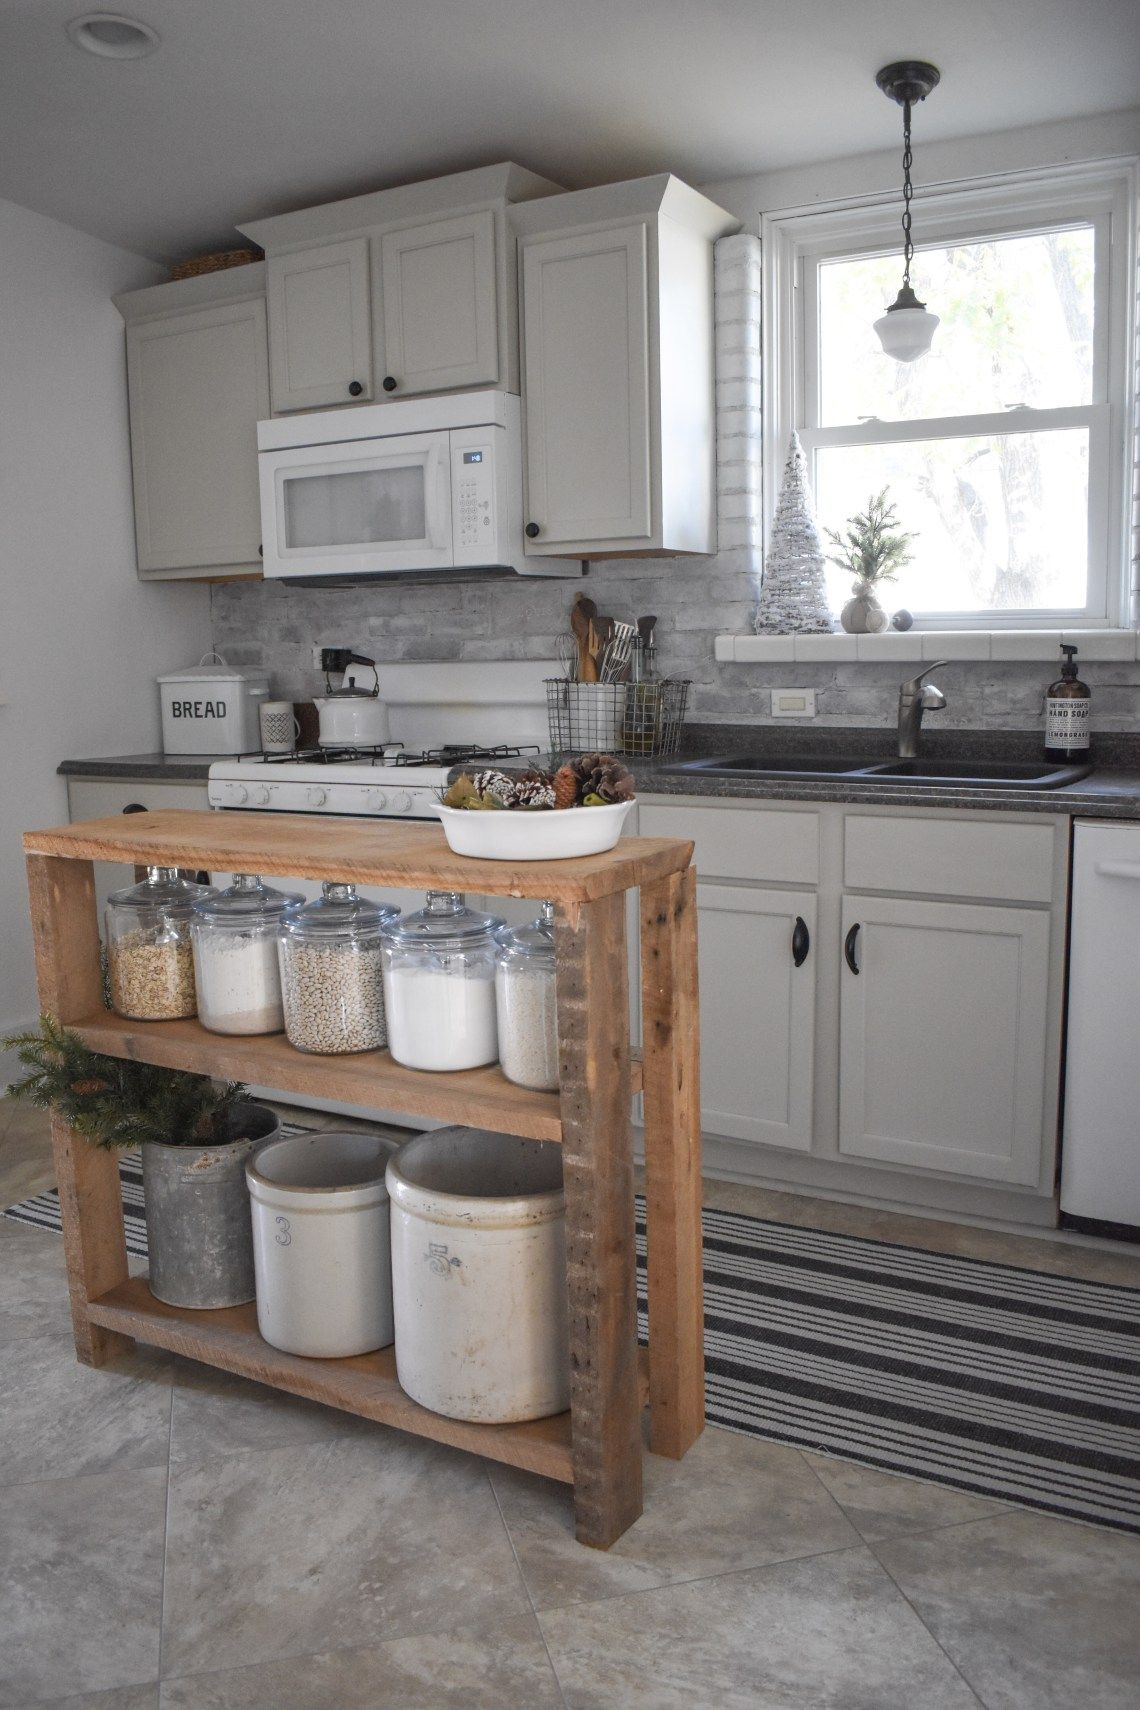 new diy kitchen island diy kitchen diy kitchen island kitchen on kitchen island ideas diy id=64117